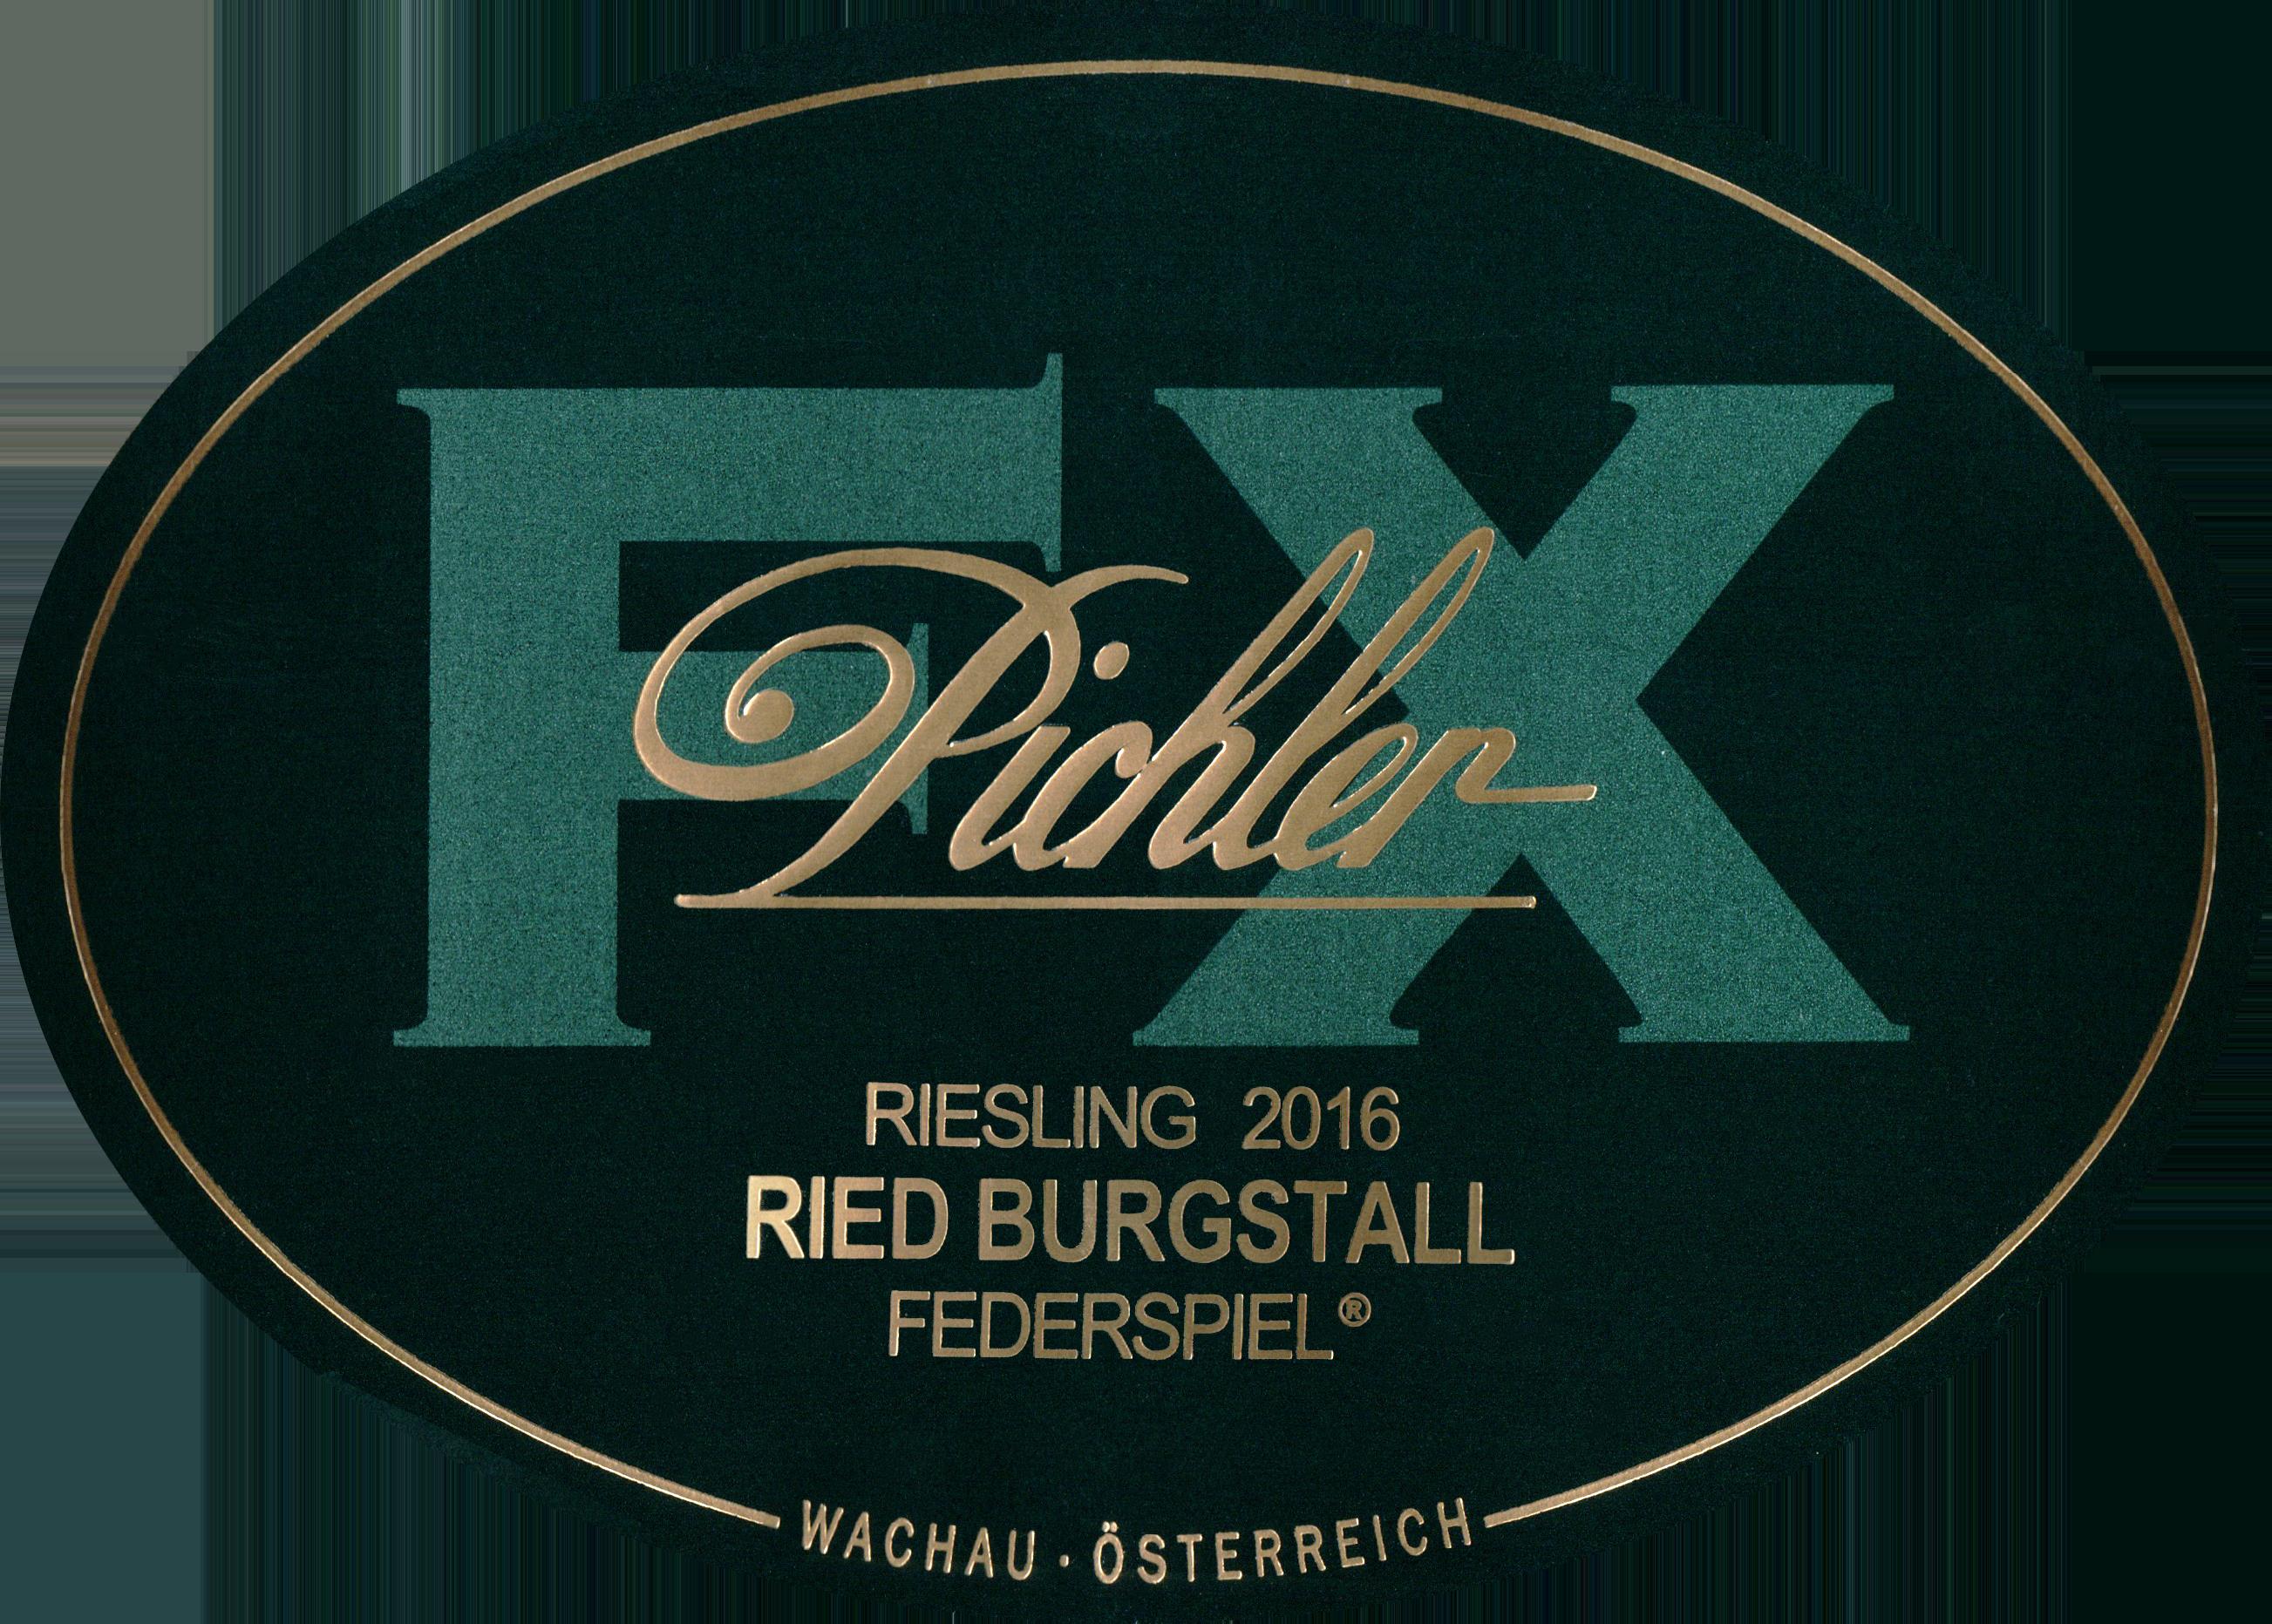 Fx Pichler Ried Burgstall Federspiel Riesling 2016